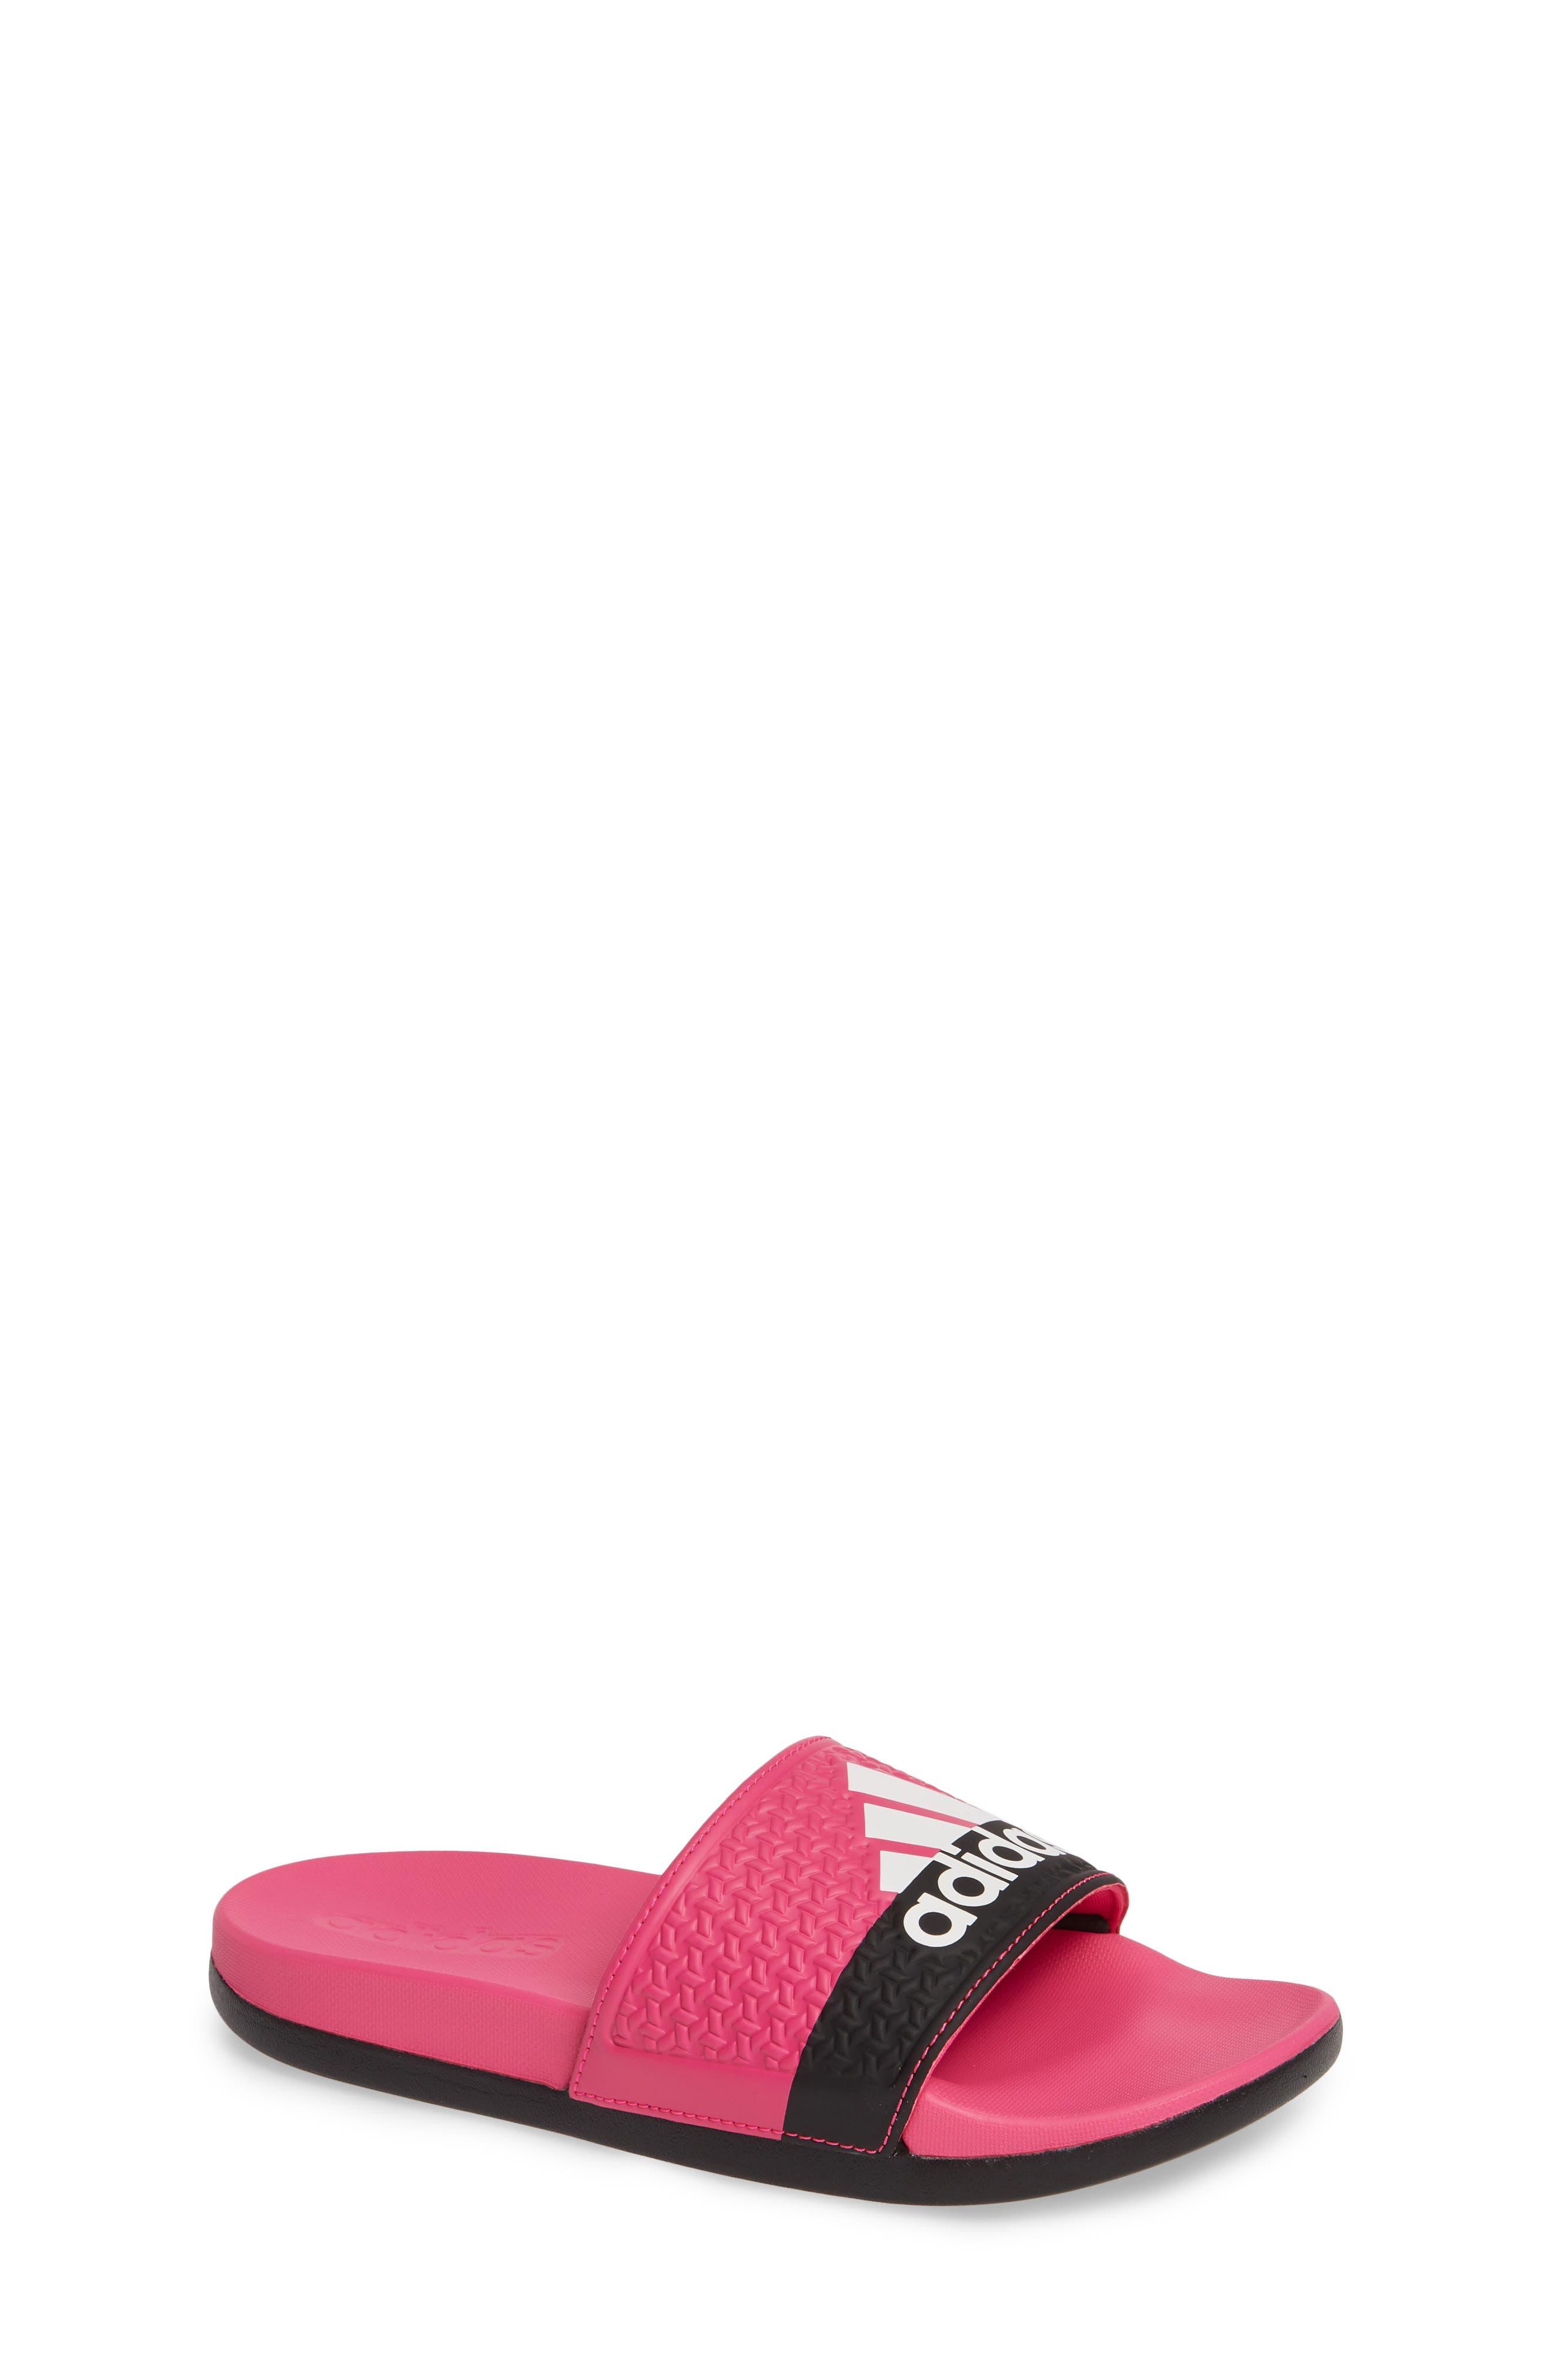 ADIDAS Adilette CF K Sport Slide, Main, color, SHOCK PINK/ WHITE/ CORE BLACK